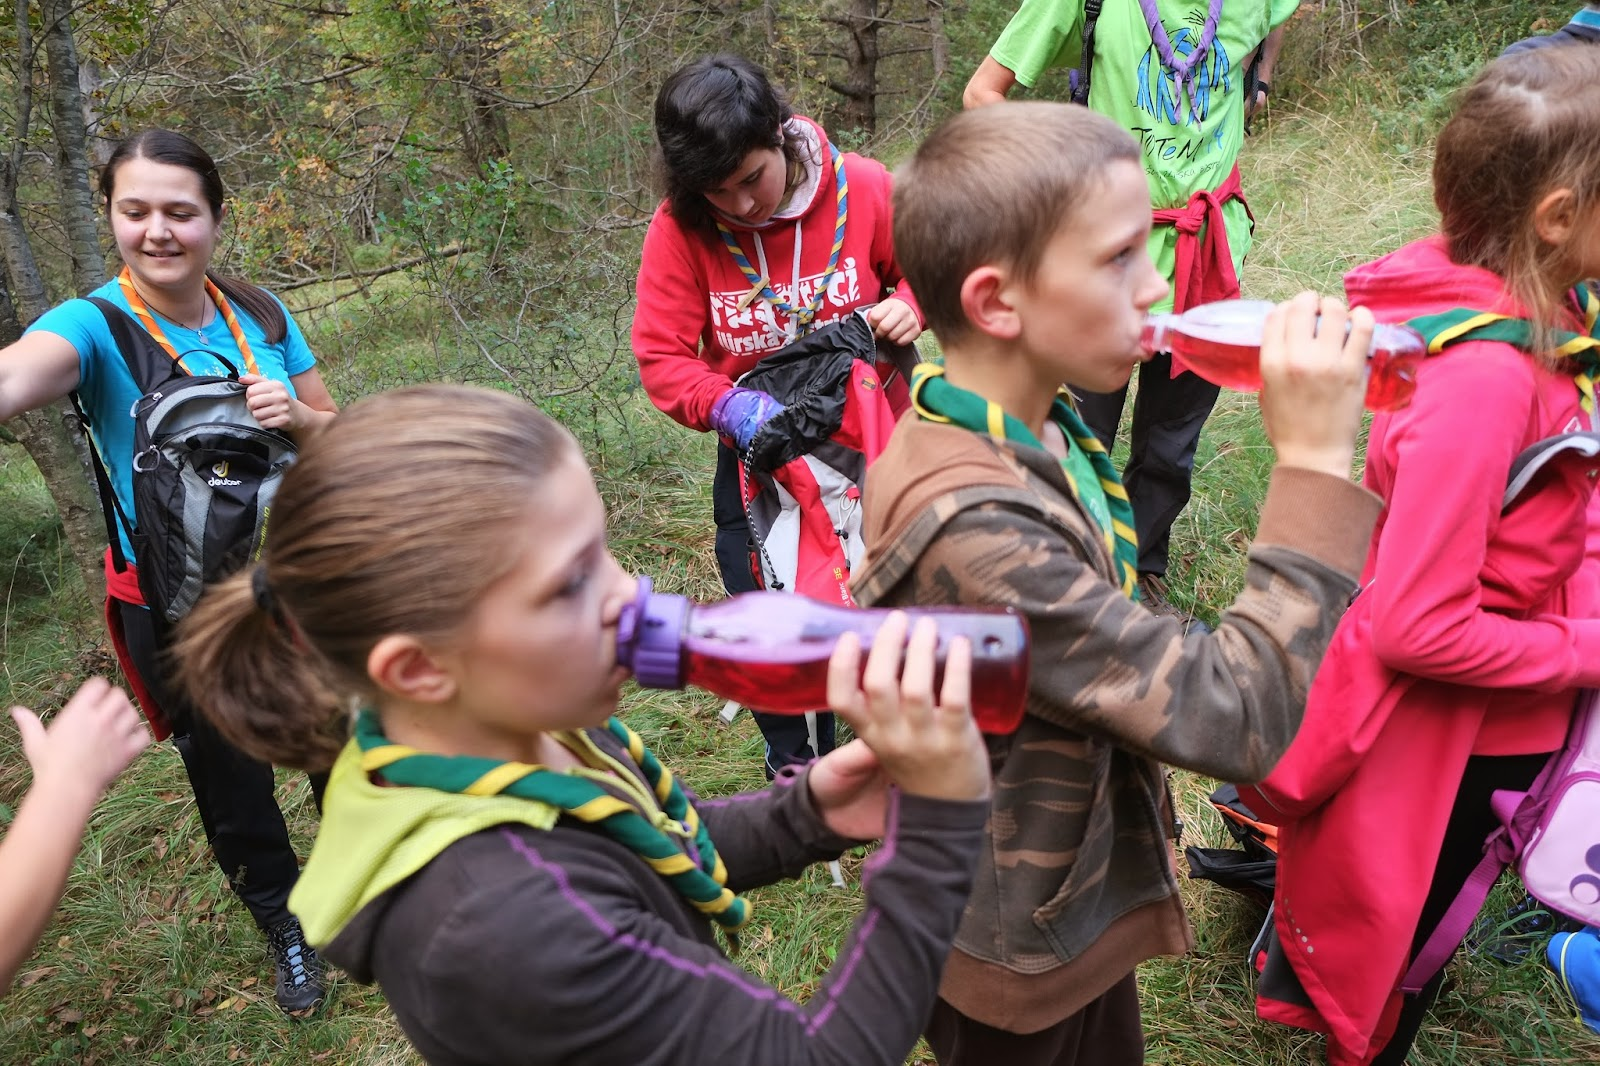 Pohod na Kozlek, Kozlek, 11.10.2014 - DSCF1083.JPG